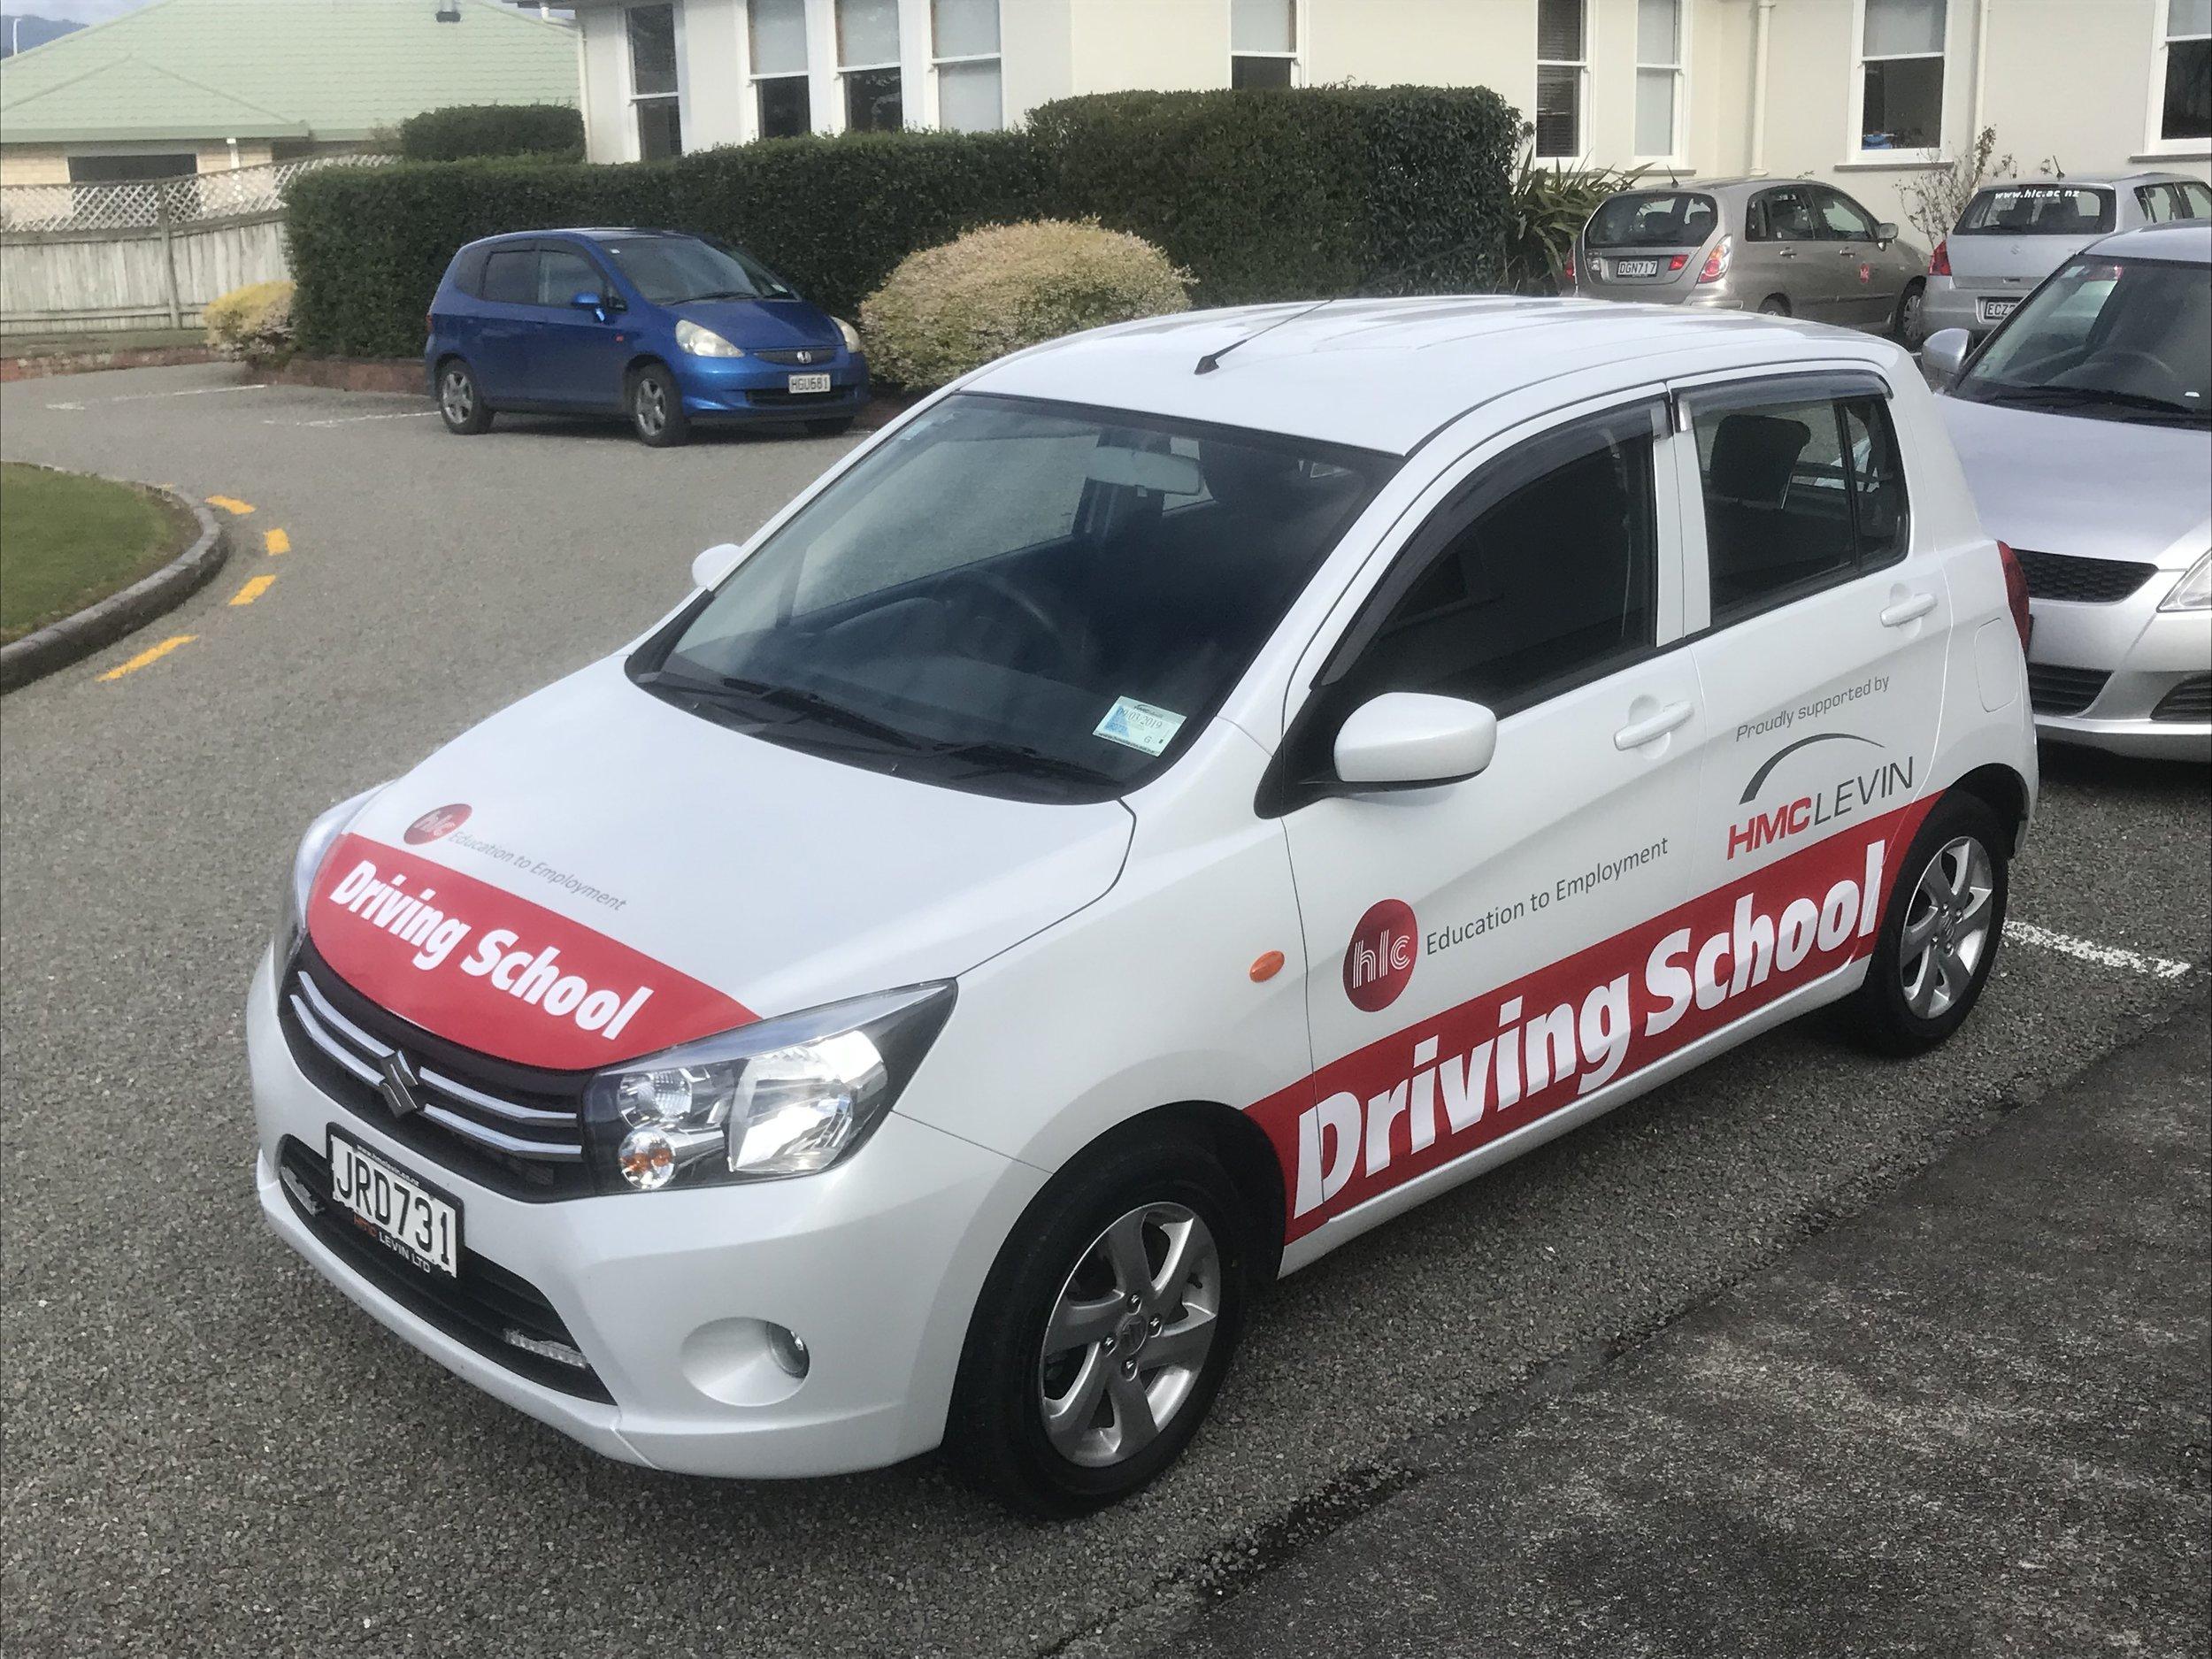 HLC Driving School Car